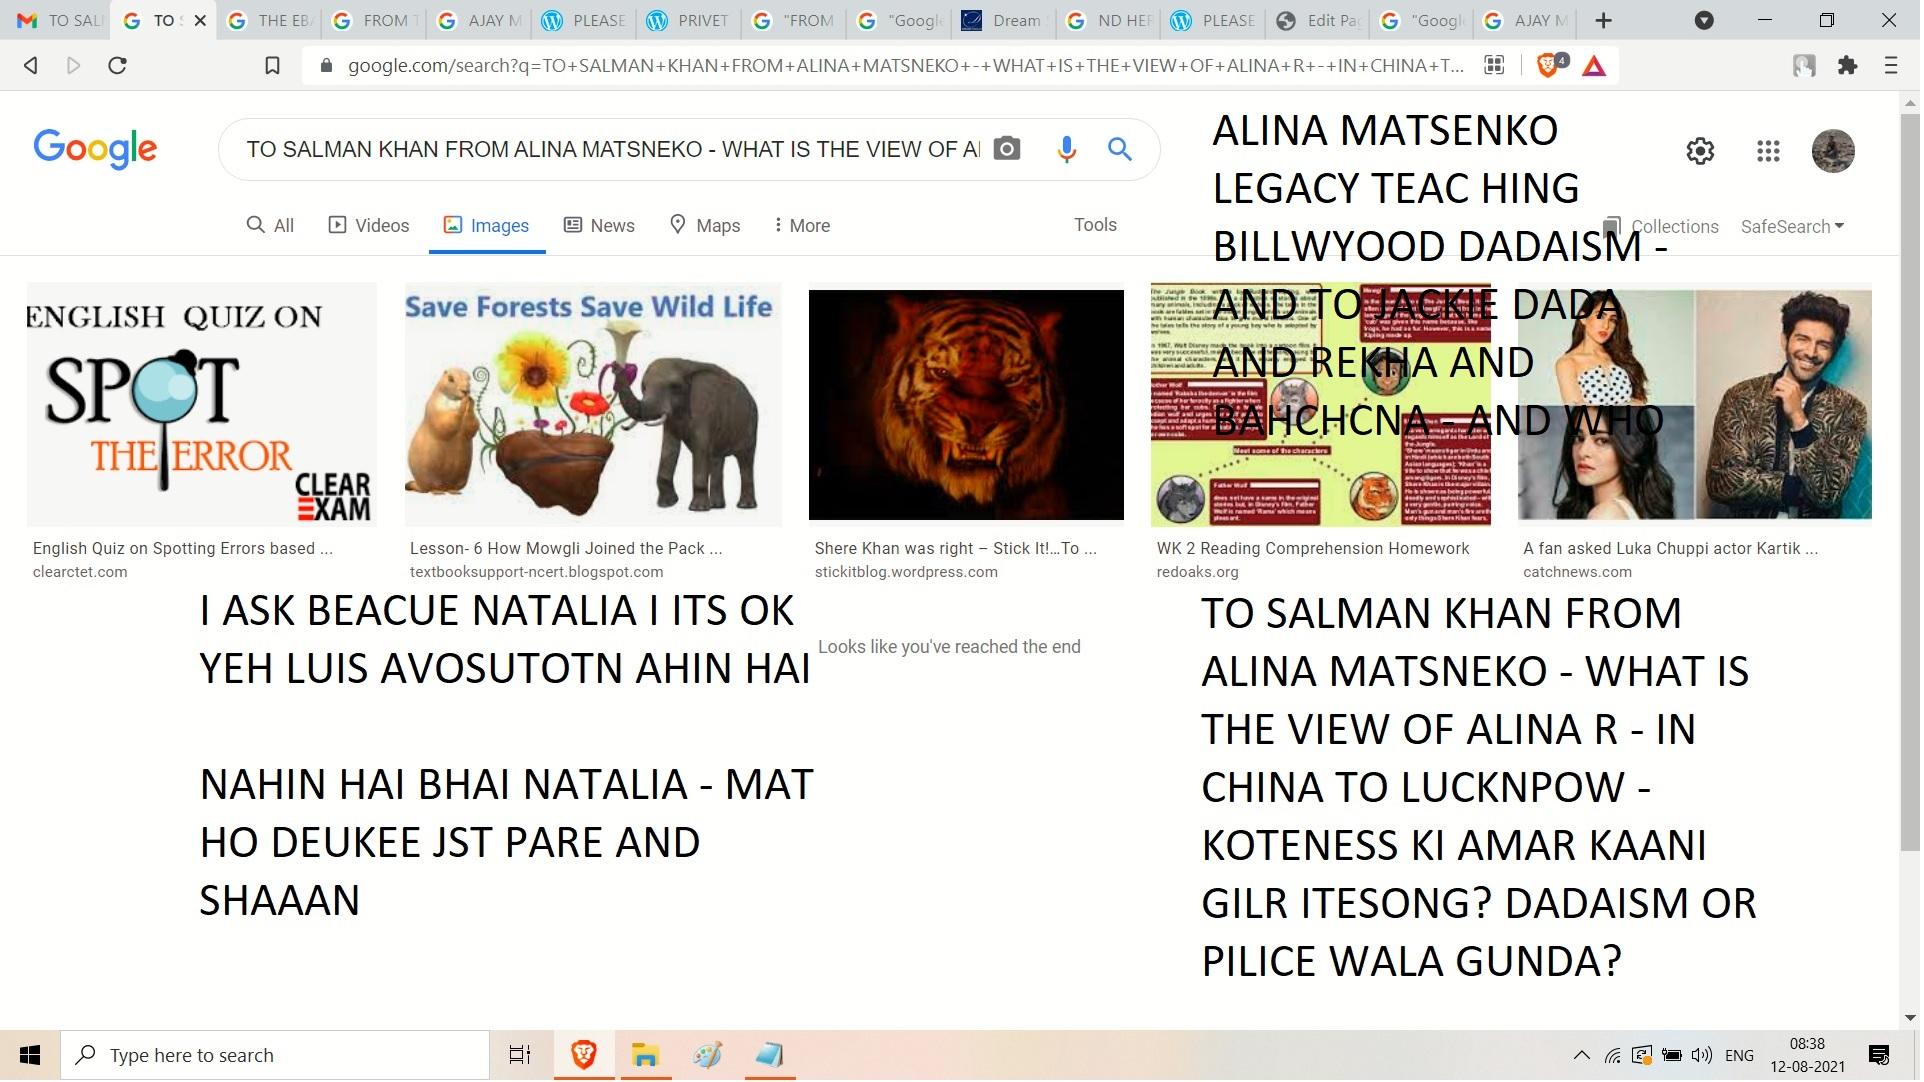 ALINA MATSENKO LEGACY TEAC HING BILLWYOOD DADAISM - AND TO JACKIE DADA AND REKHA AND BAHCHCNA - AND WHO